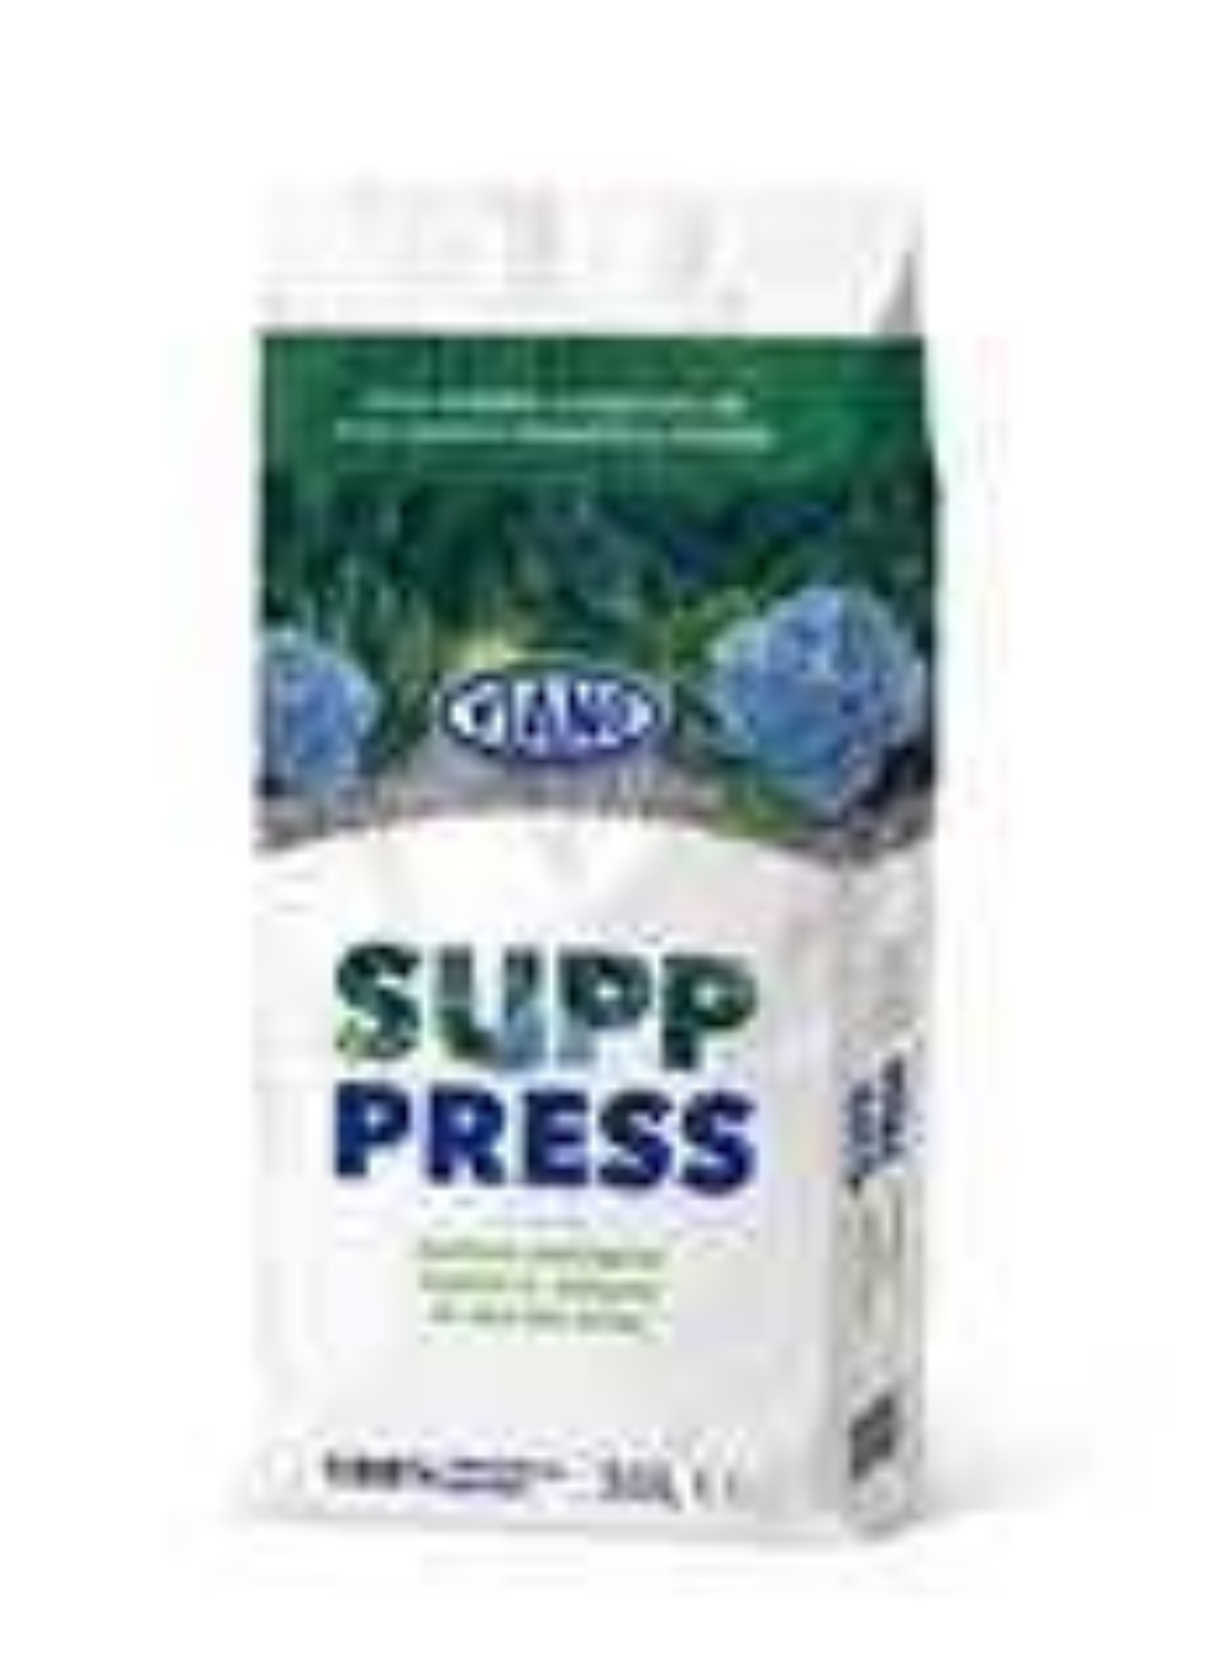 SUP-Press onkruidgroei - onkruid voorkomen 30L